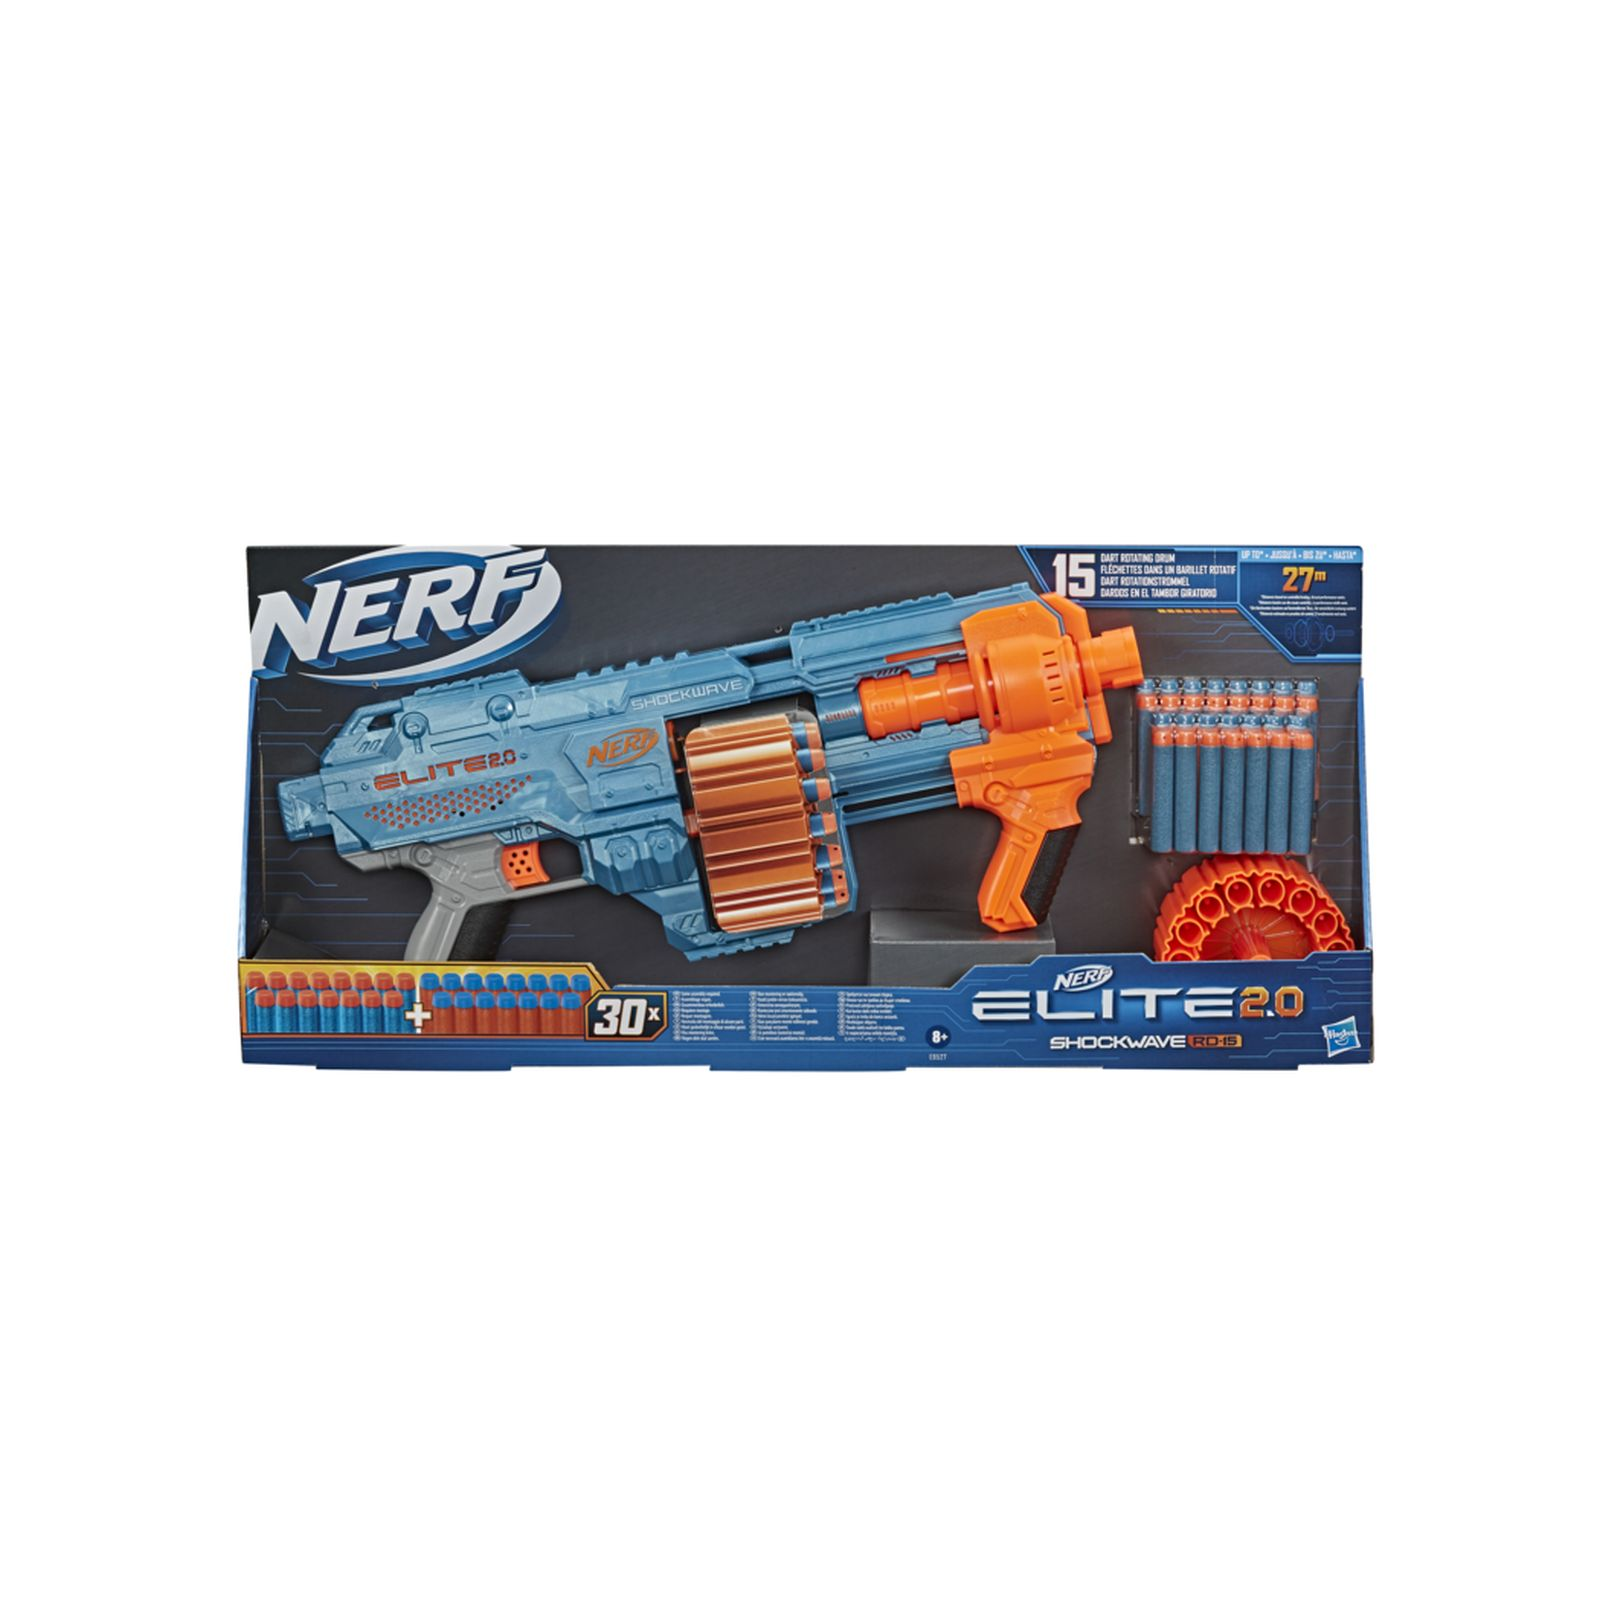 Nerf elite 2.0 shockwave rd 15 - NERF